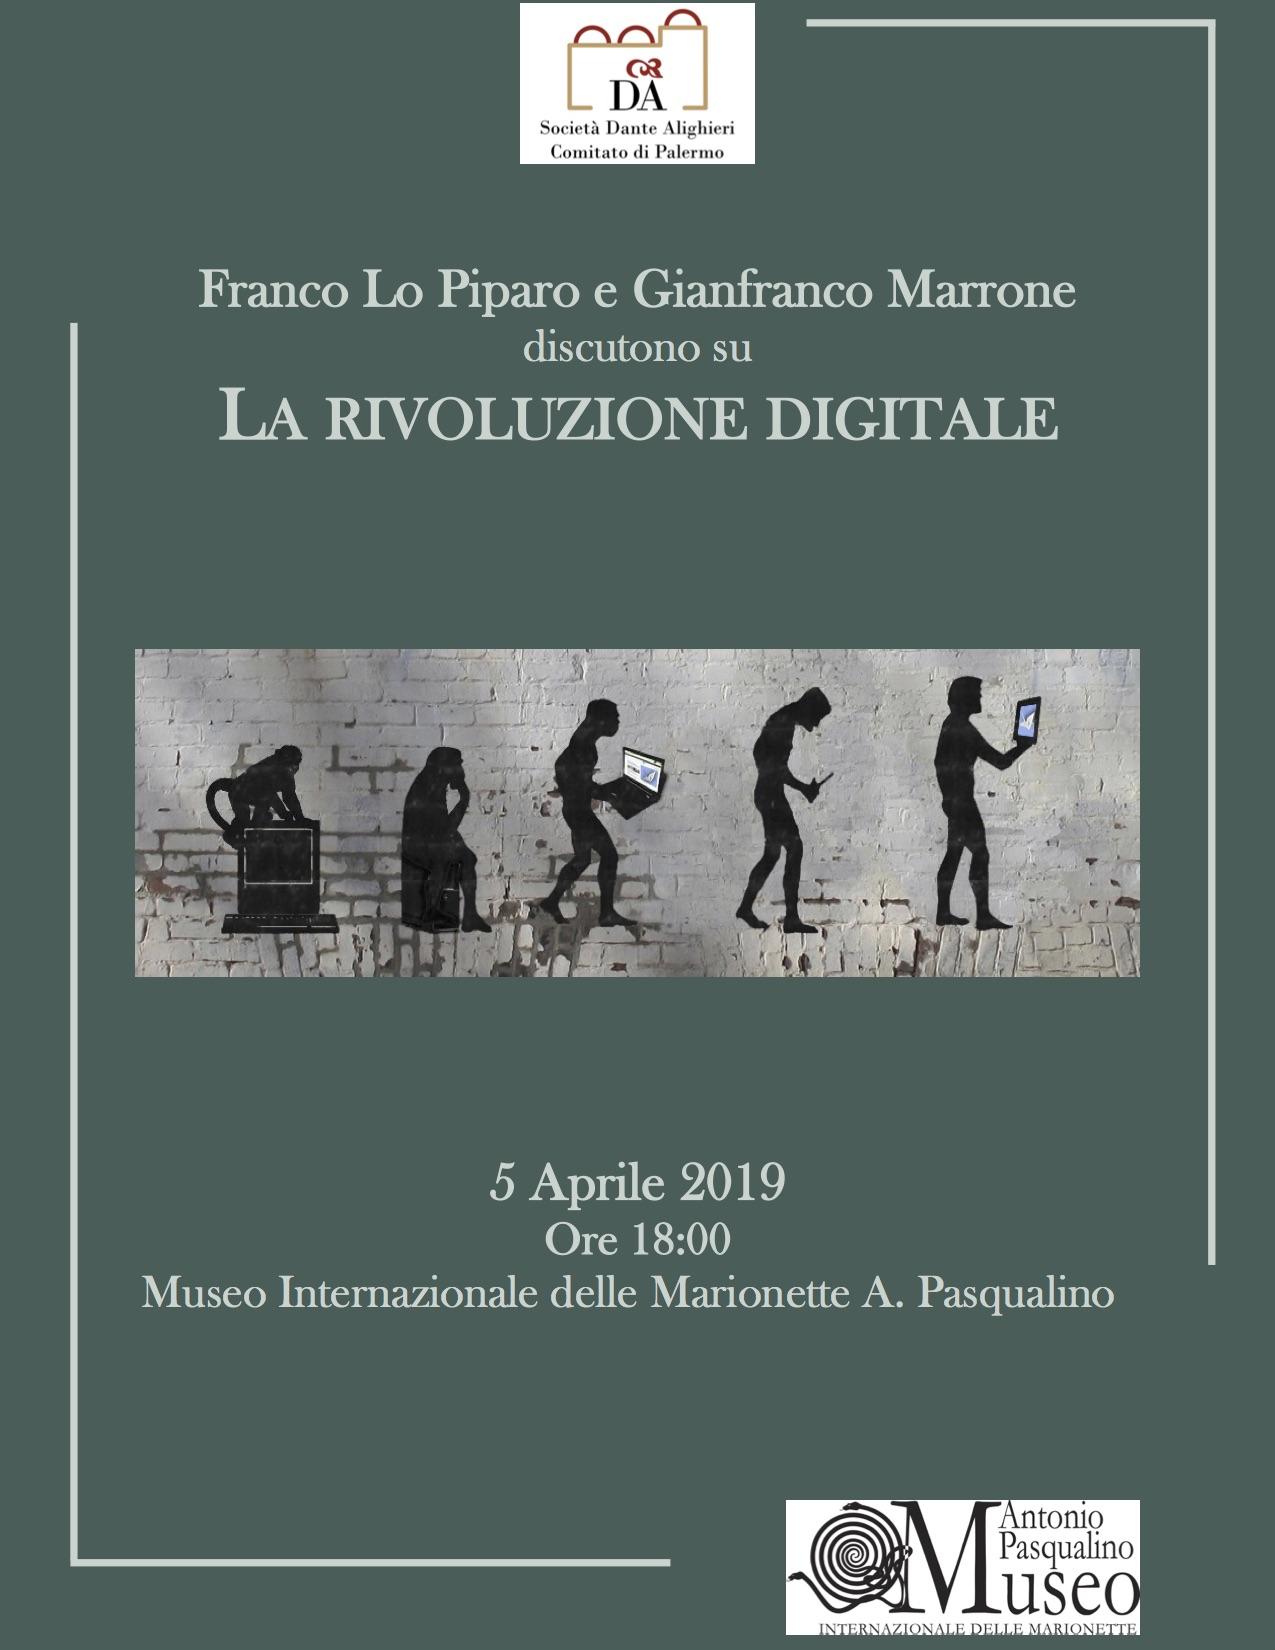 2019_conferenza_rivoluzione_digitale.jpg - 247.68 kB